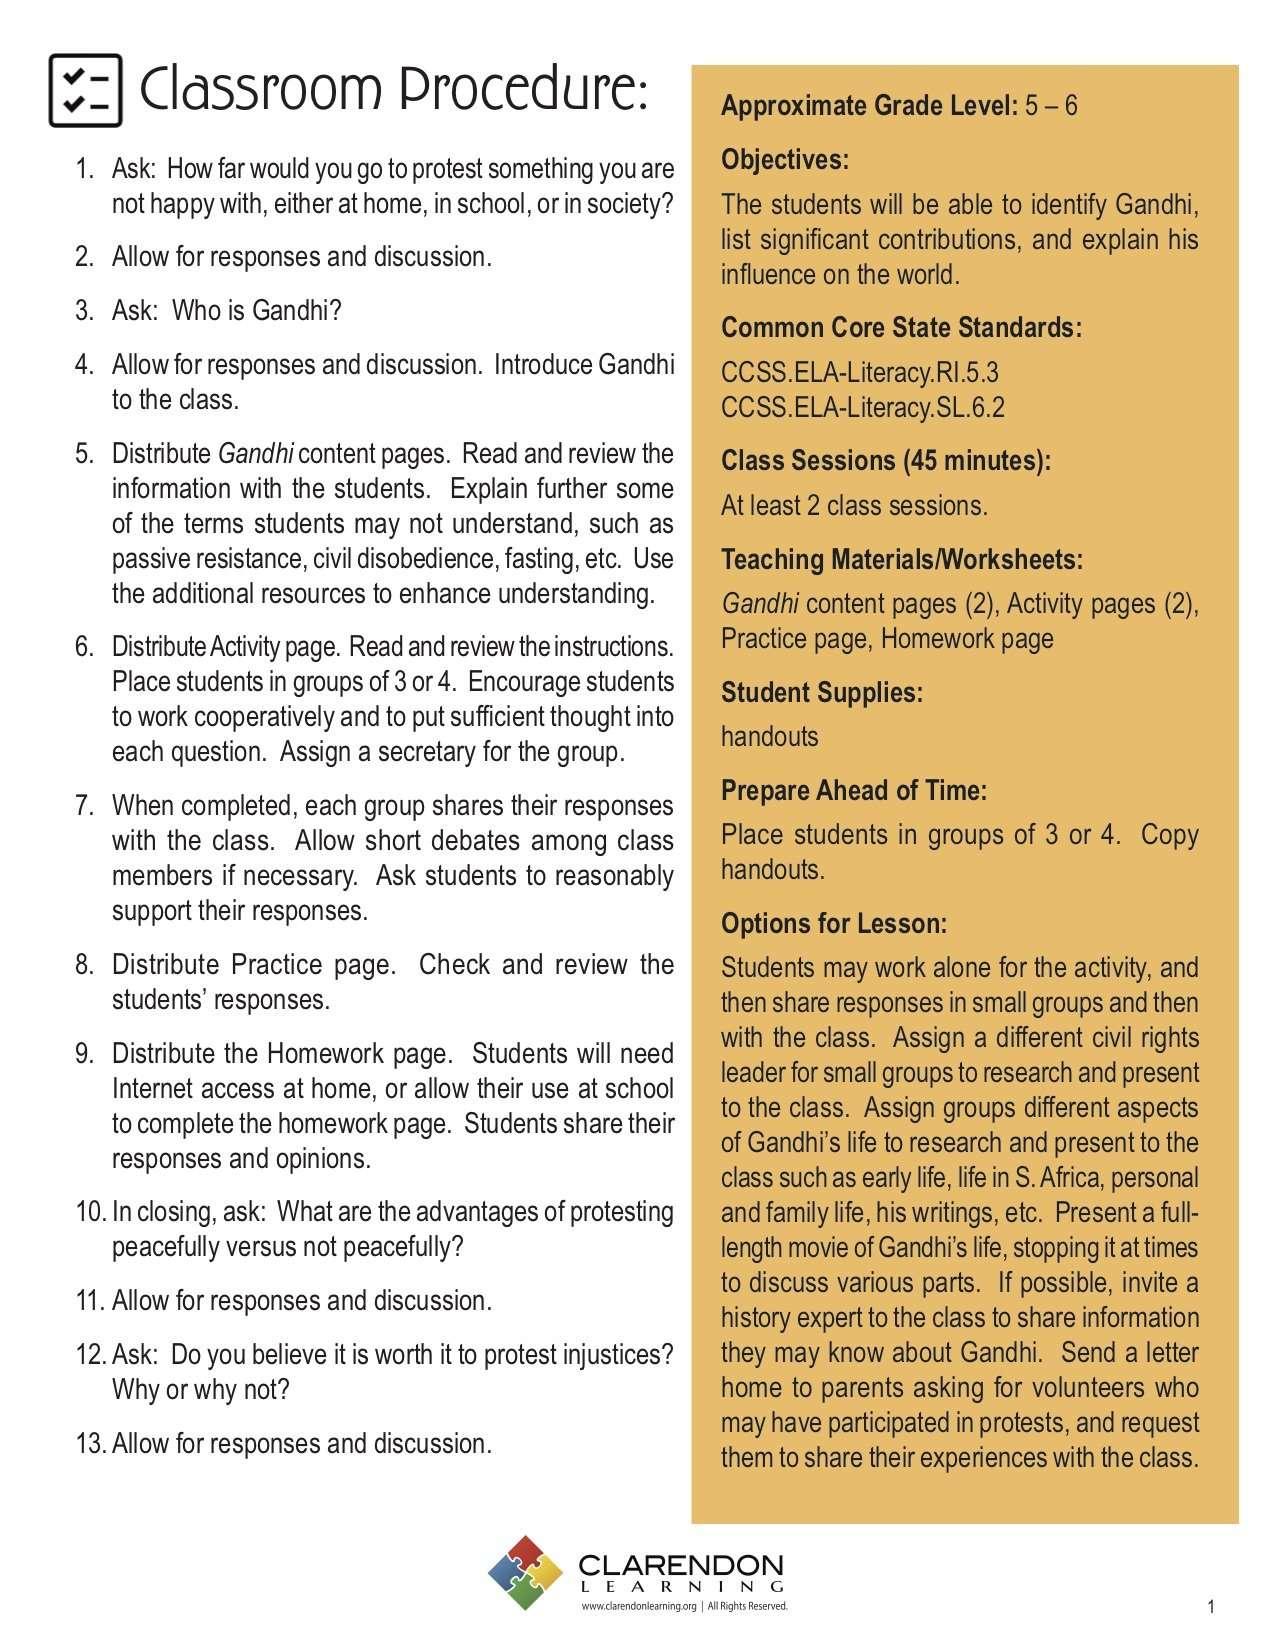 Gandhi Lesson Plan | Clarendon Learning